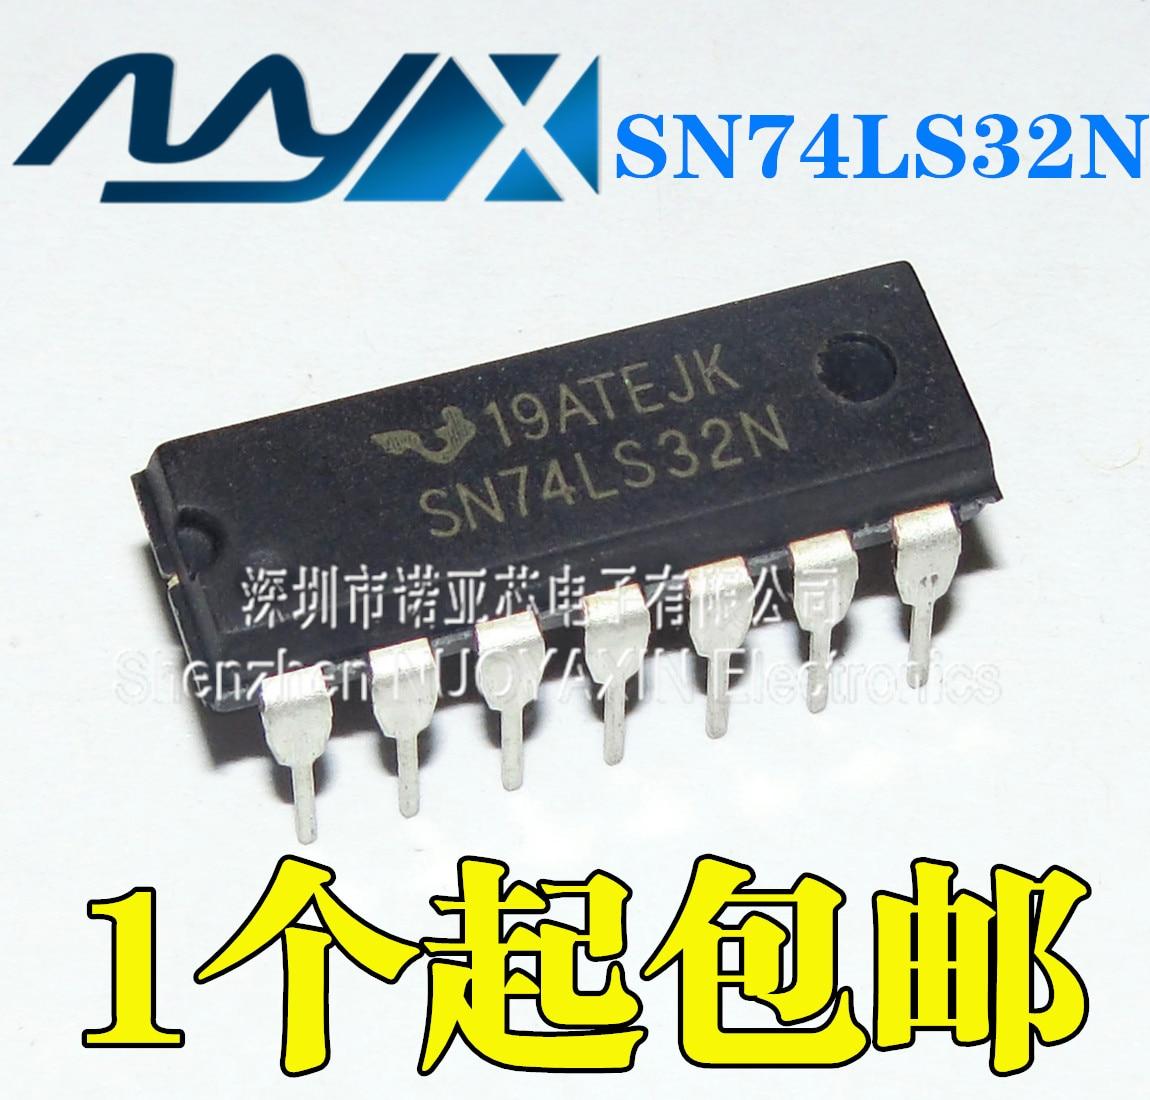 Lote de 10 unidades, nuevo, 74LS32, SN74LS32N, HD74LS32P, Chip Logic DIP14